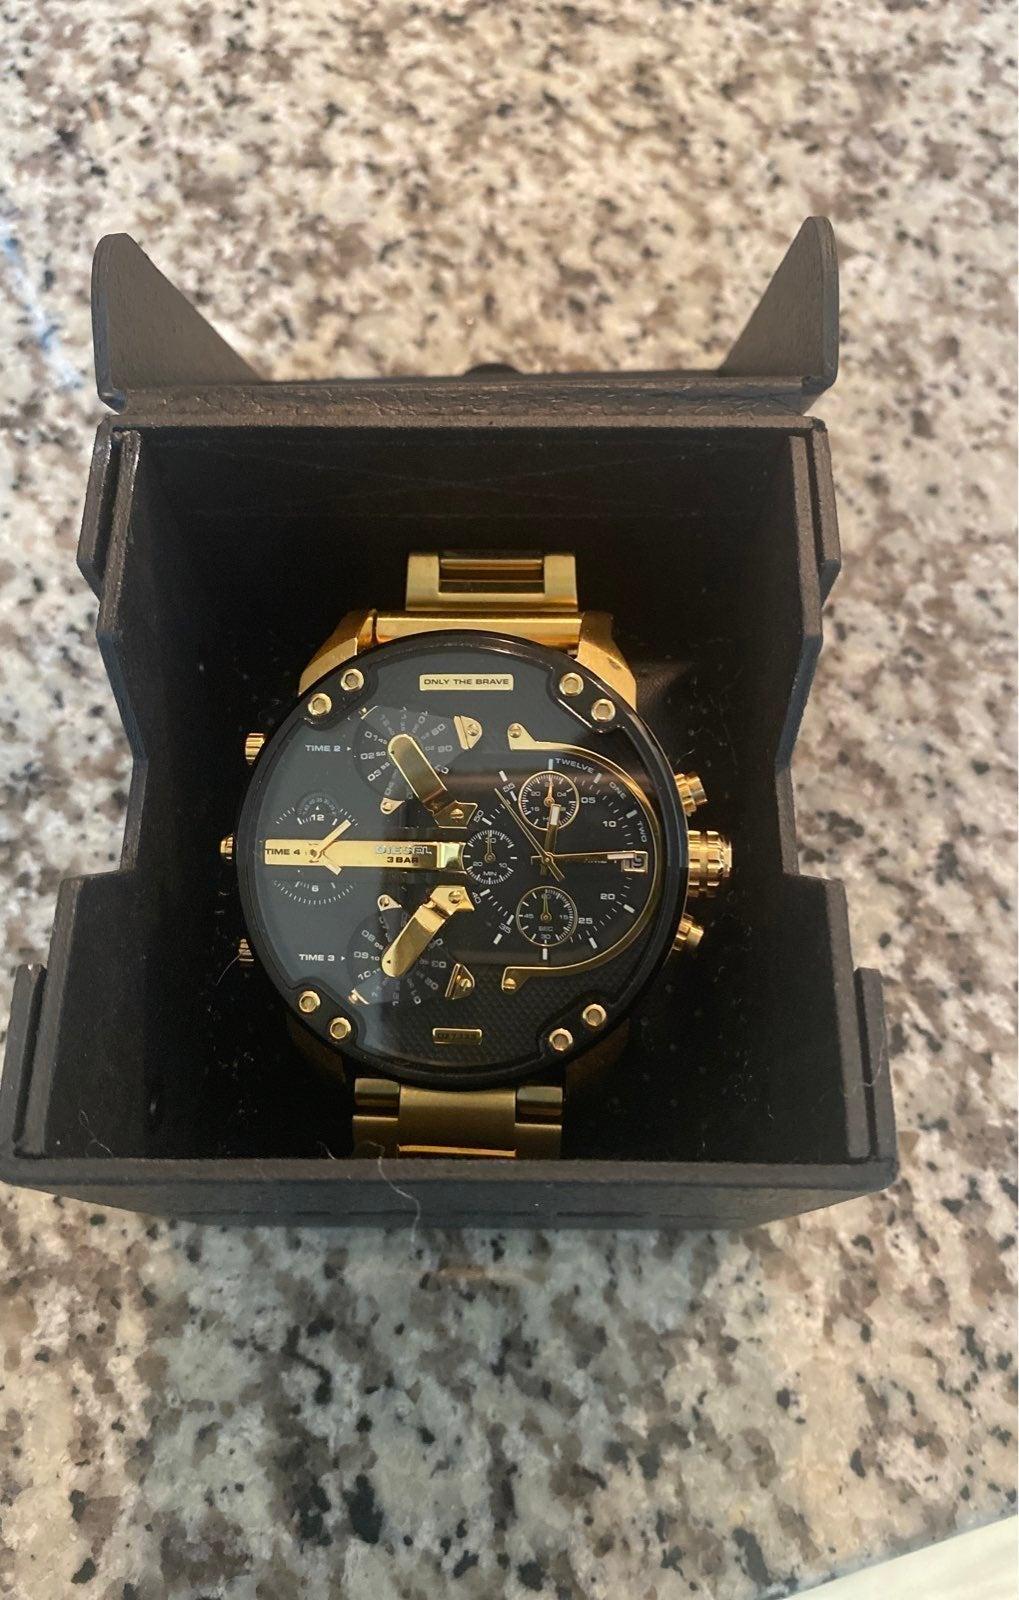 Diesel watch - black and gold